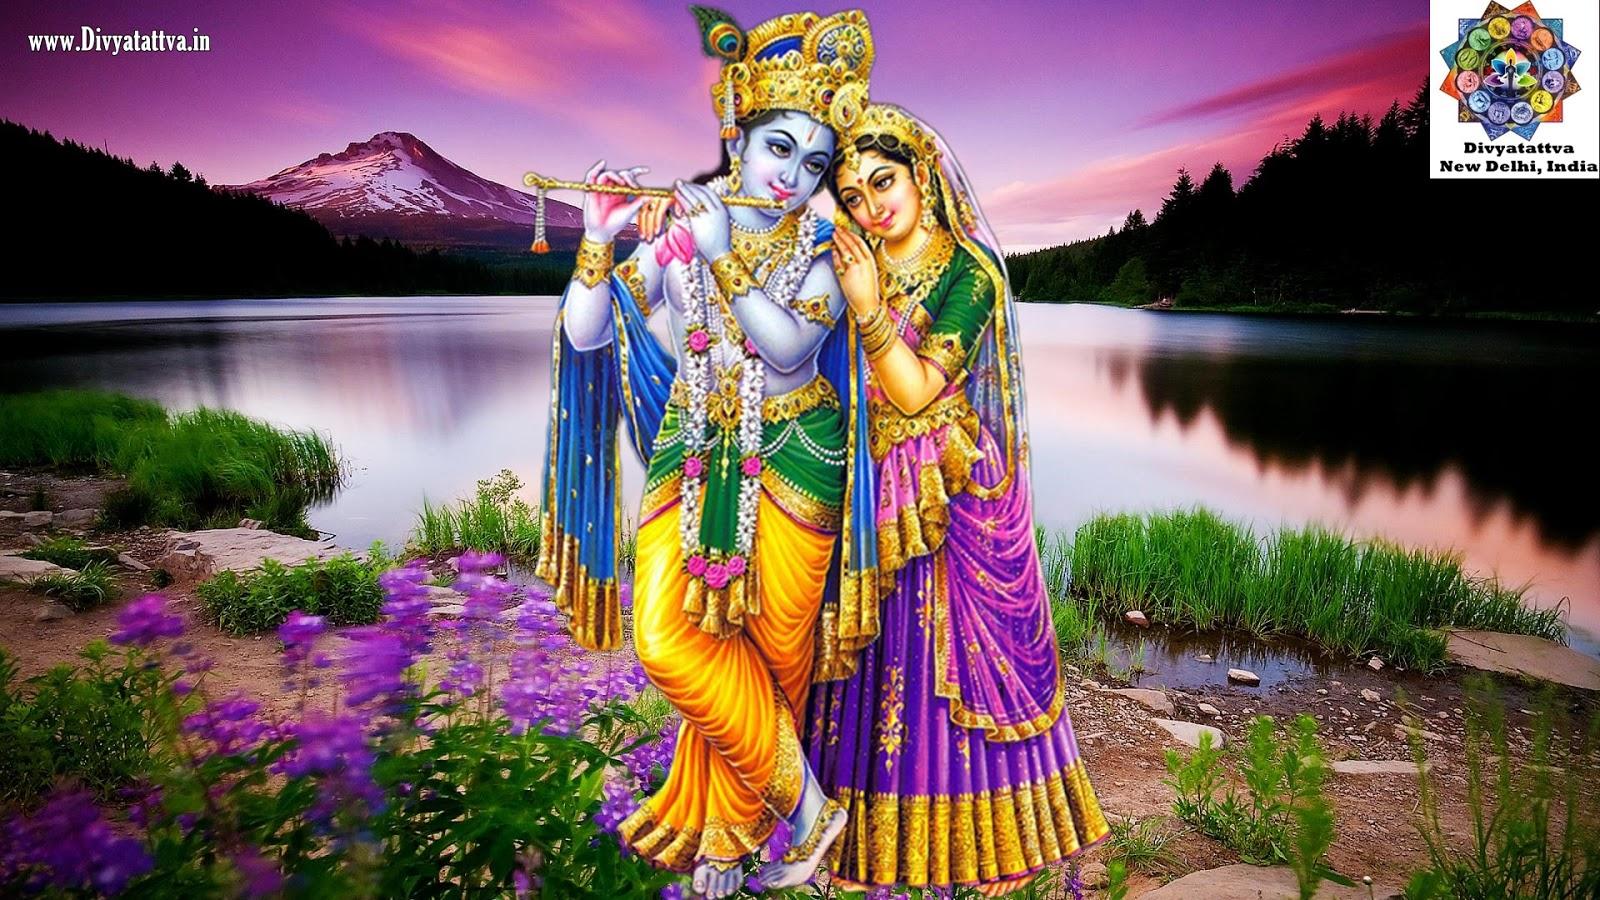 radha hd wallpaper goddess krishna govinda hd fb backgrounds laptop iphone nature www.divyatattva.in